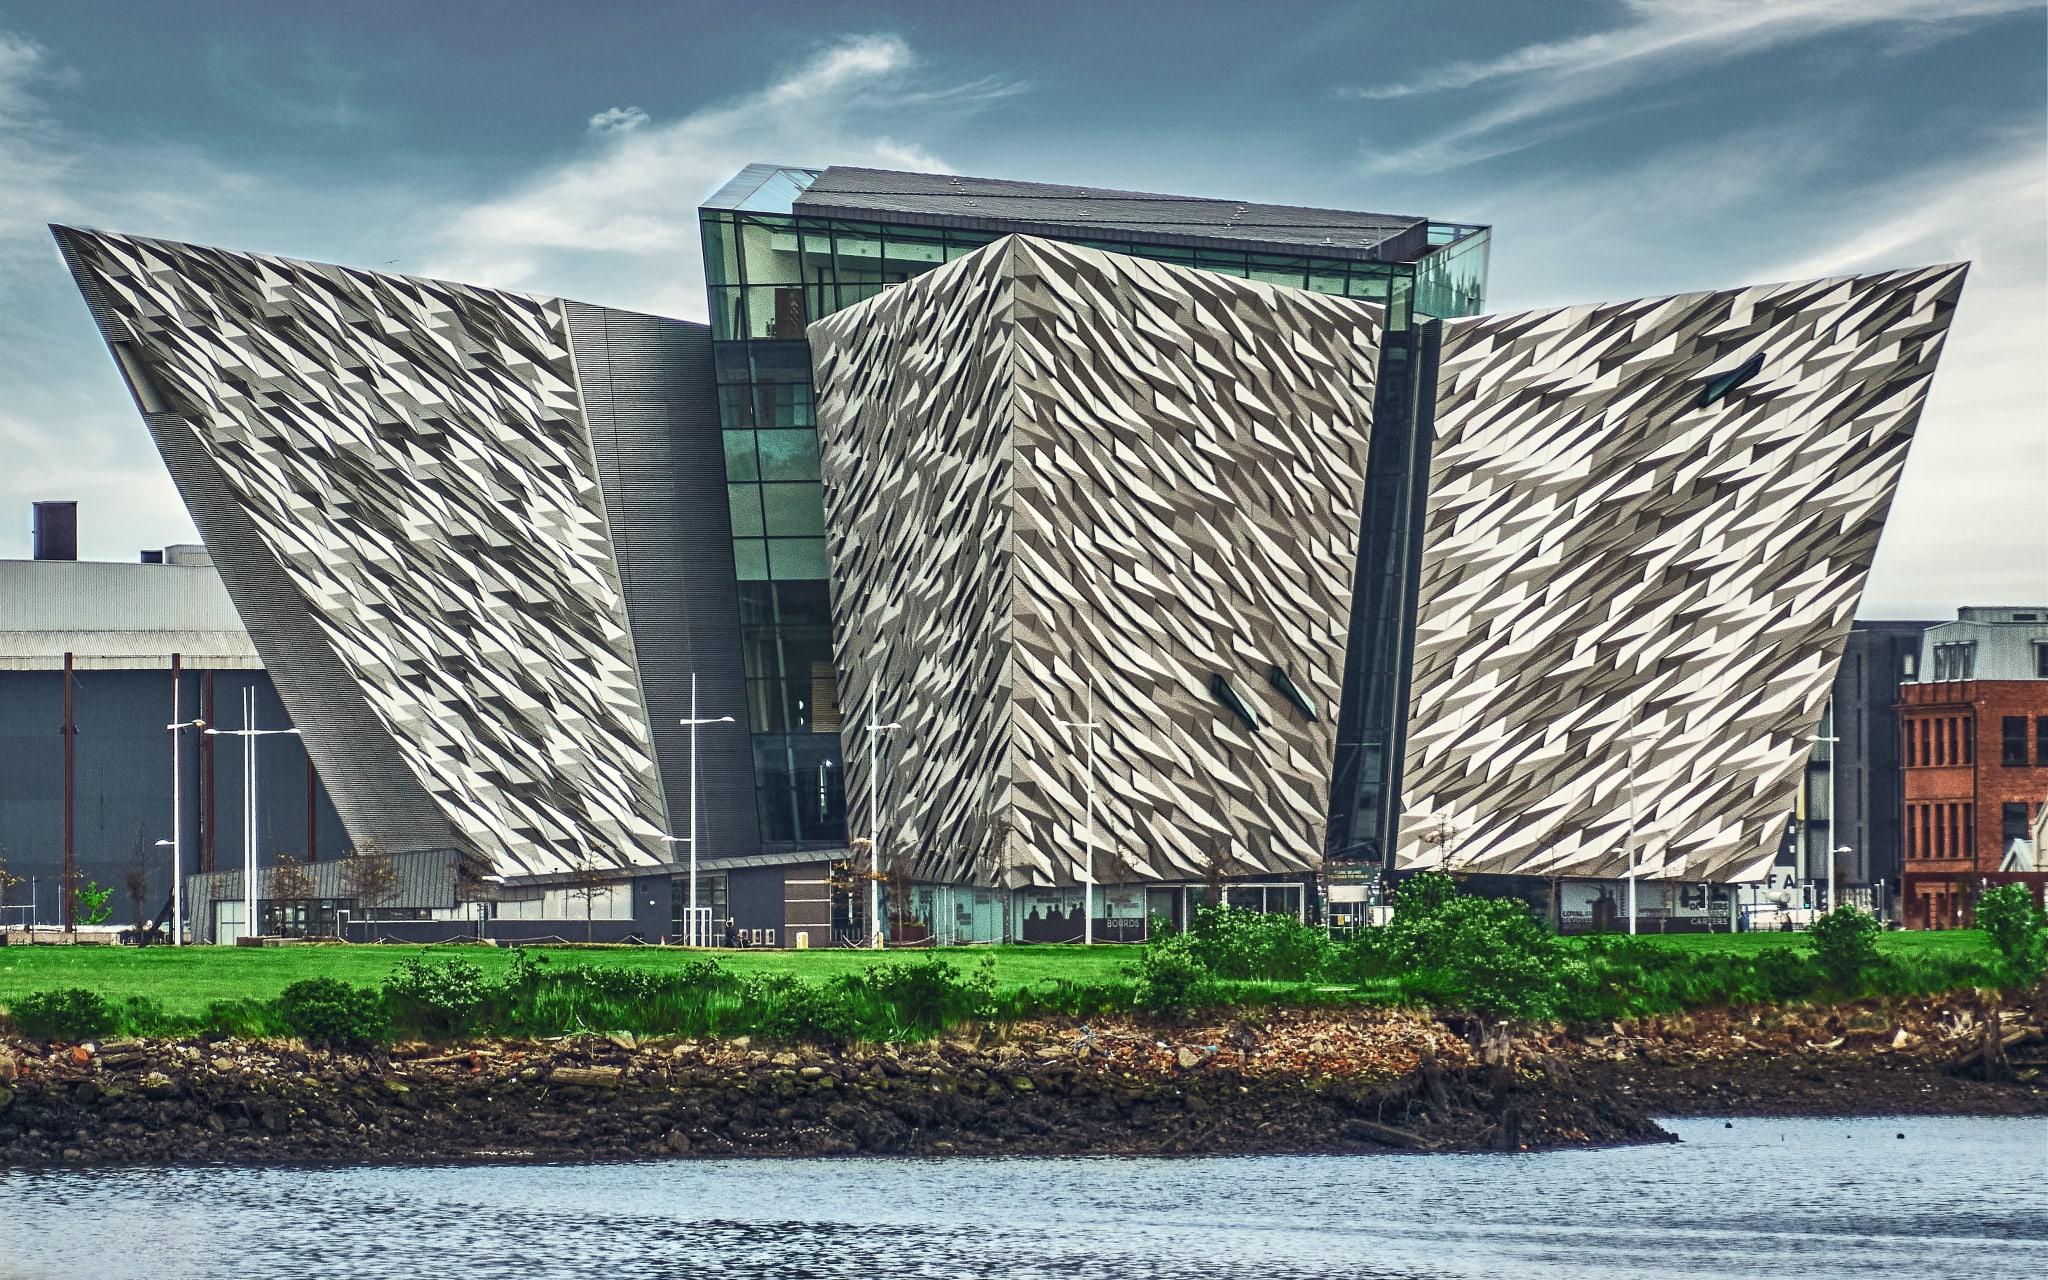 Belfast - Belfast's Titanic story: Walking in the footsteps of a legend (Part 2)